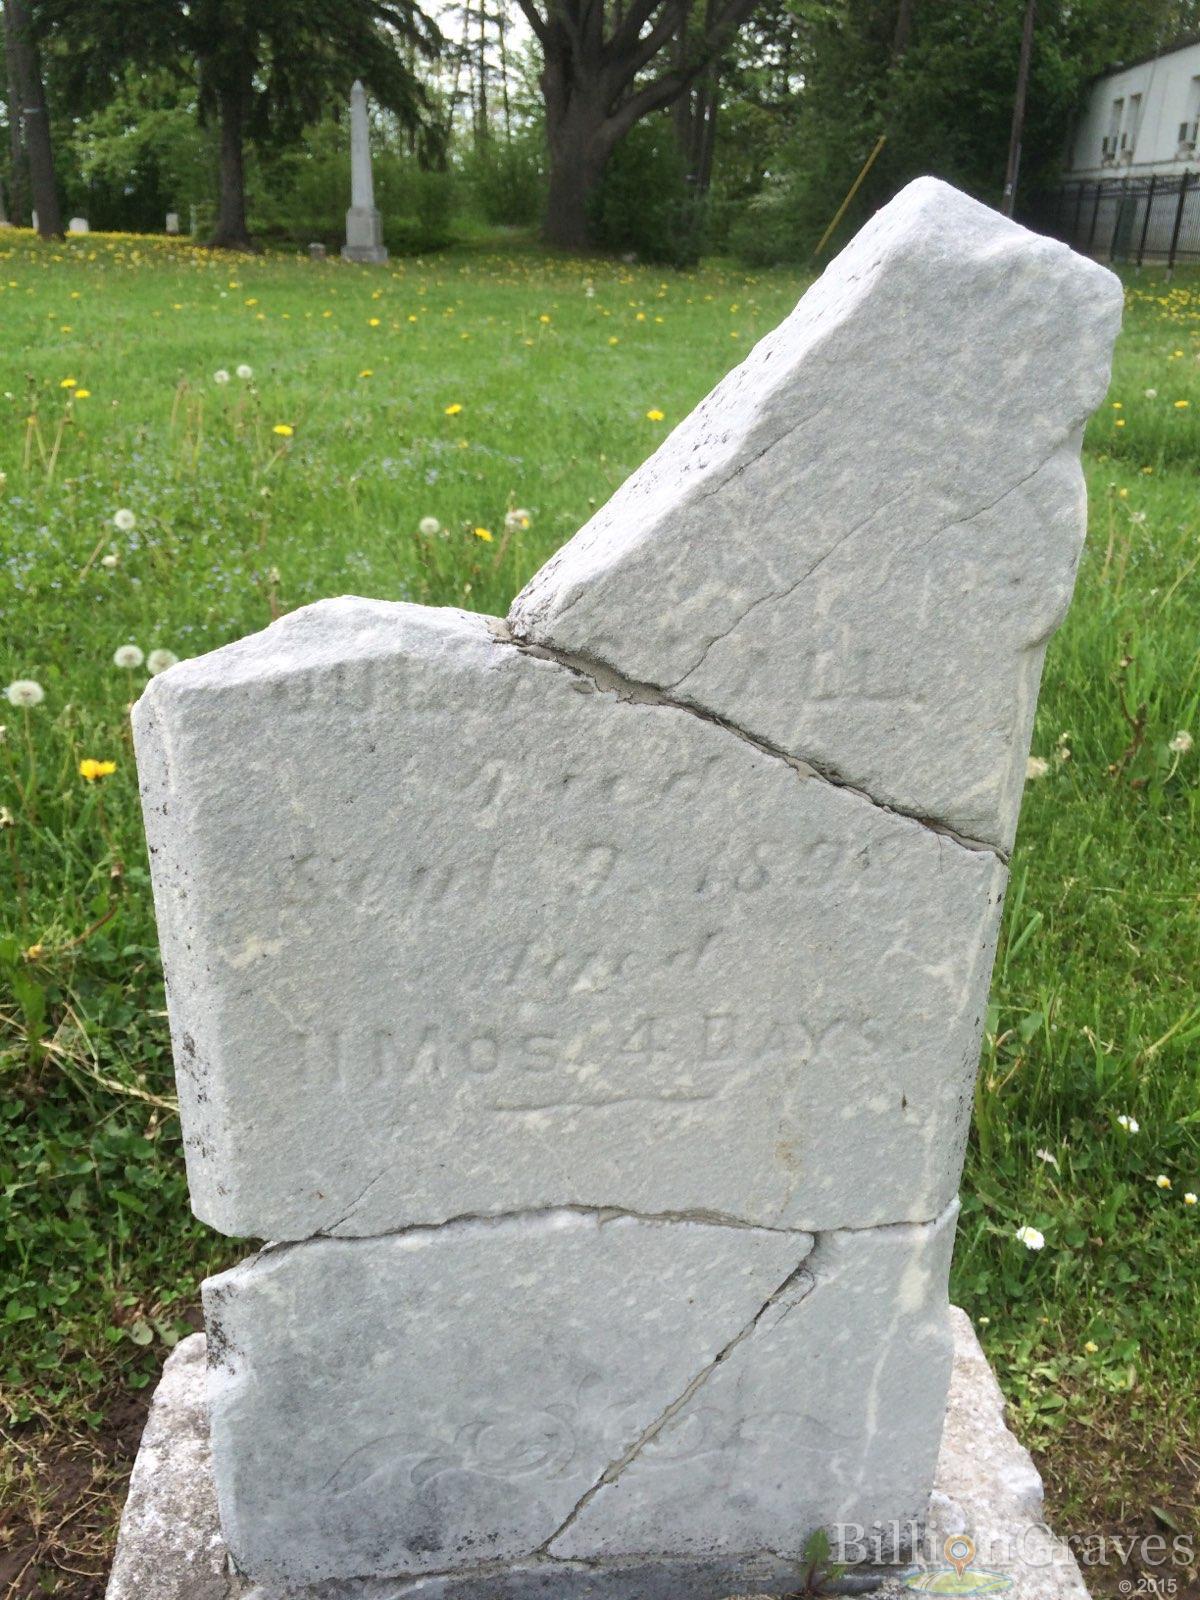 BillionGraves, gravestone, grave, damaged gravestones, cemetery, family history, ancestors, community service project, JustServe, BillionGraves app, broken gravestone